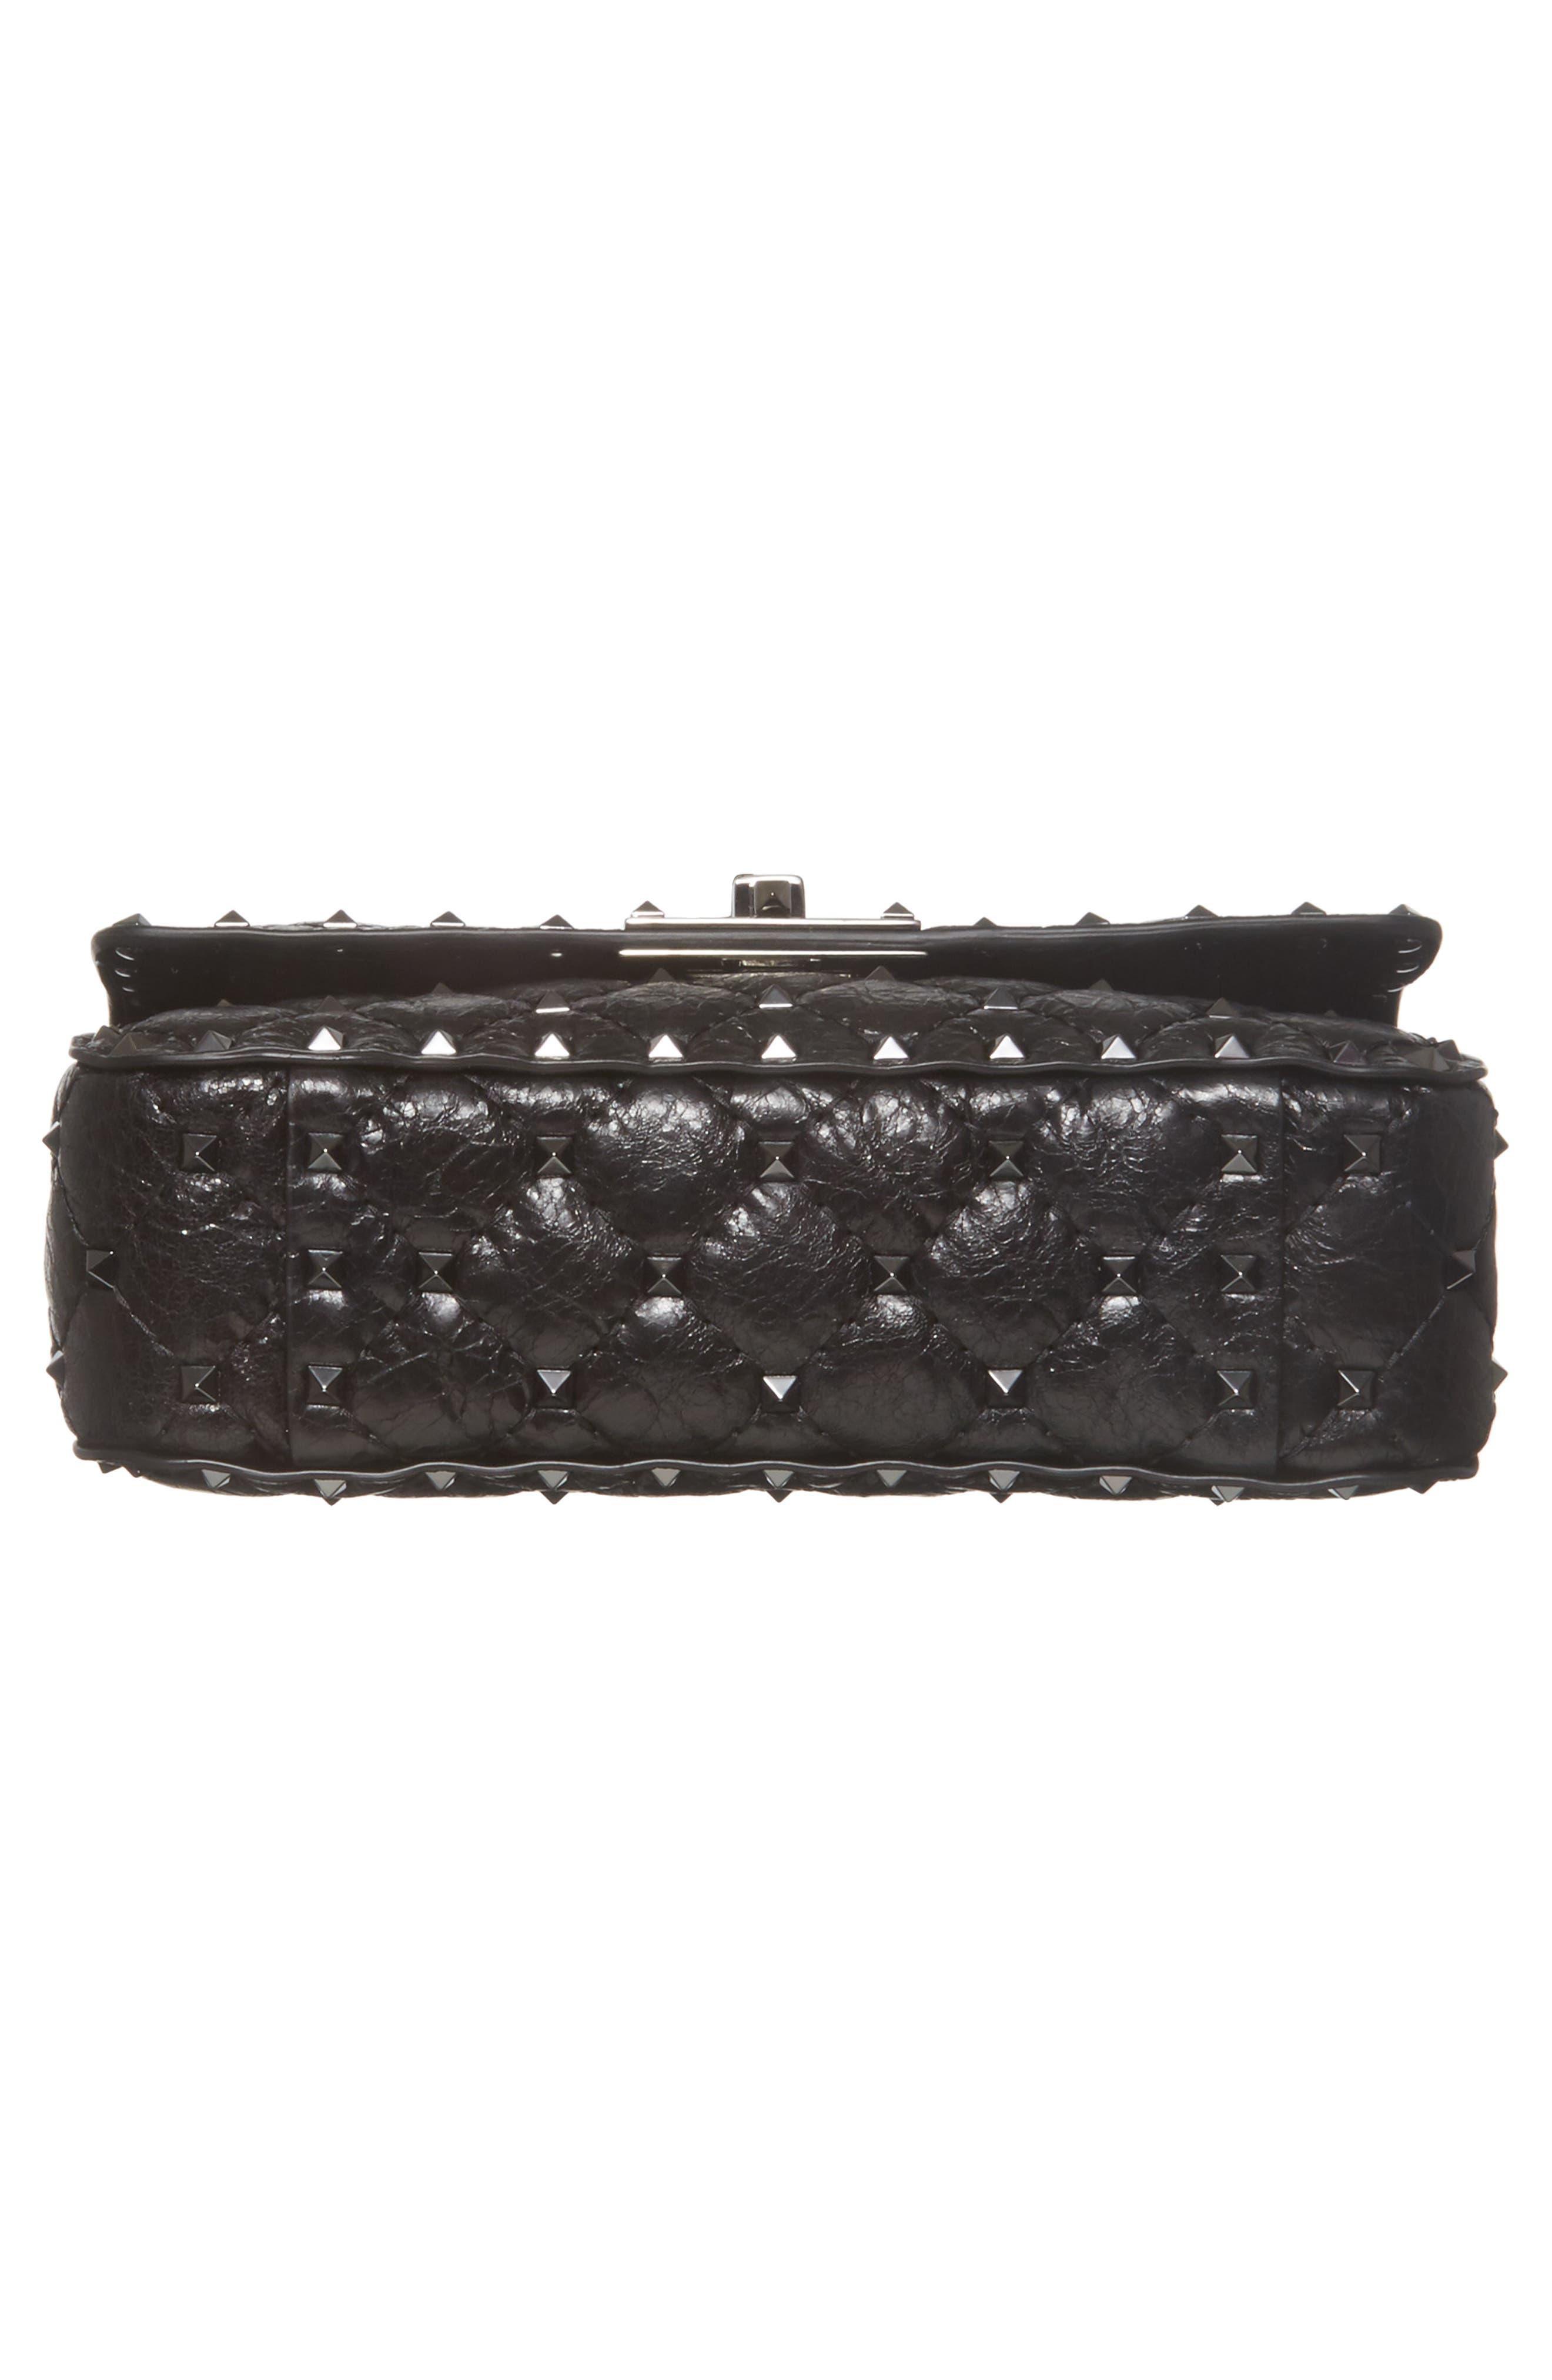 Vitello Rockstud Leather Shoulder Bag,                             Alternate thumbnail 6, color,                             001